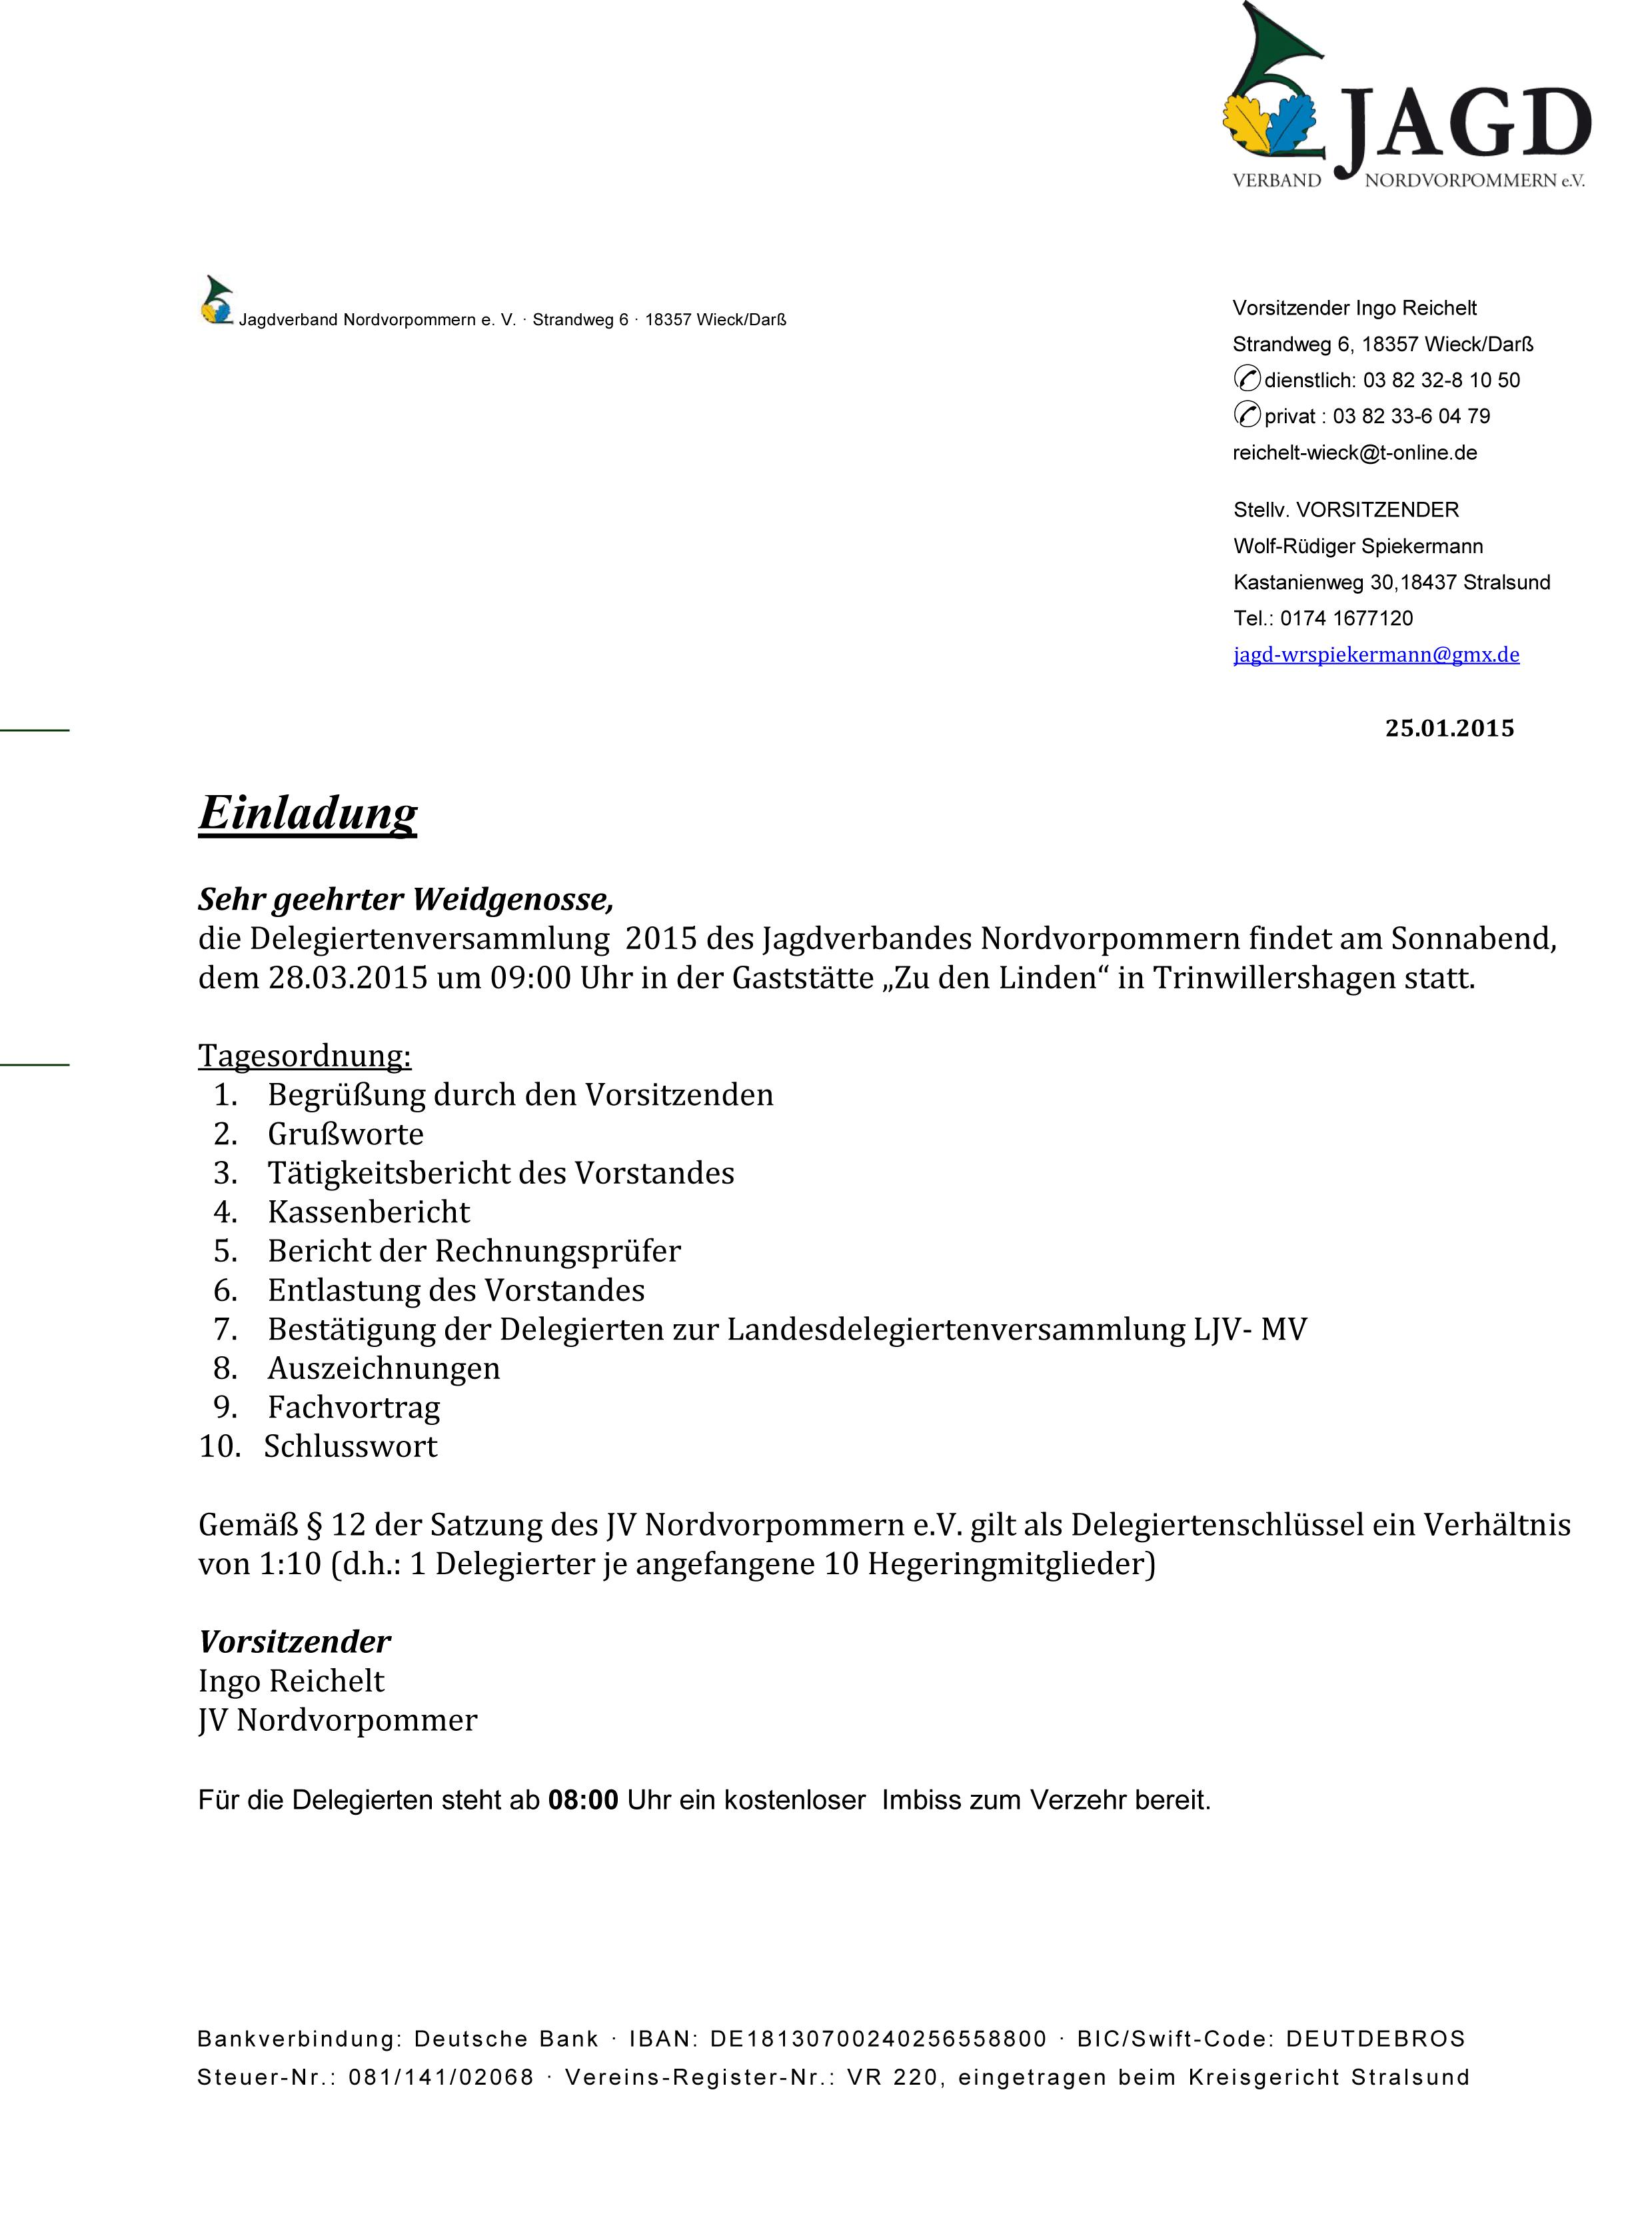 Einladung-DK-JV-NVP-2015